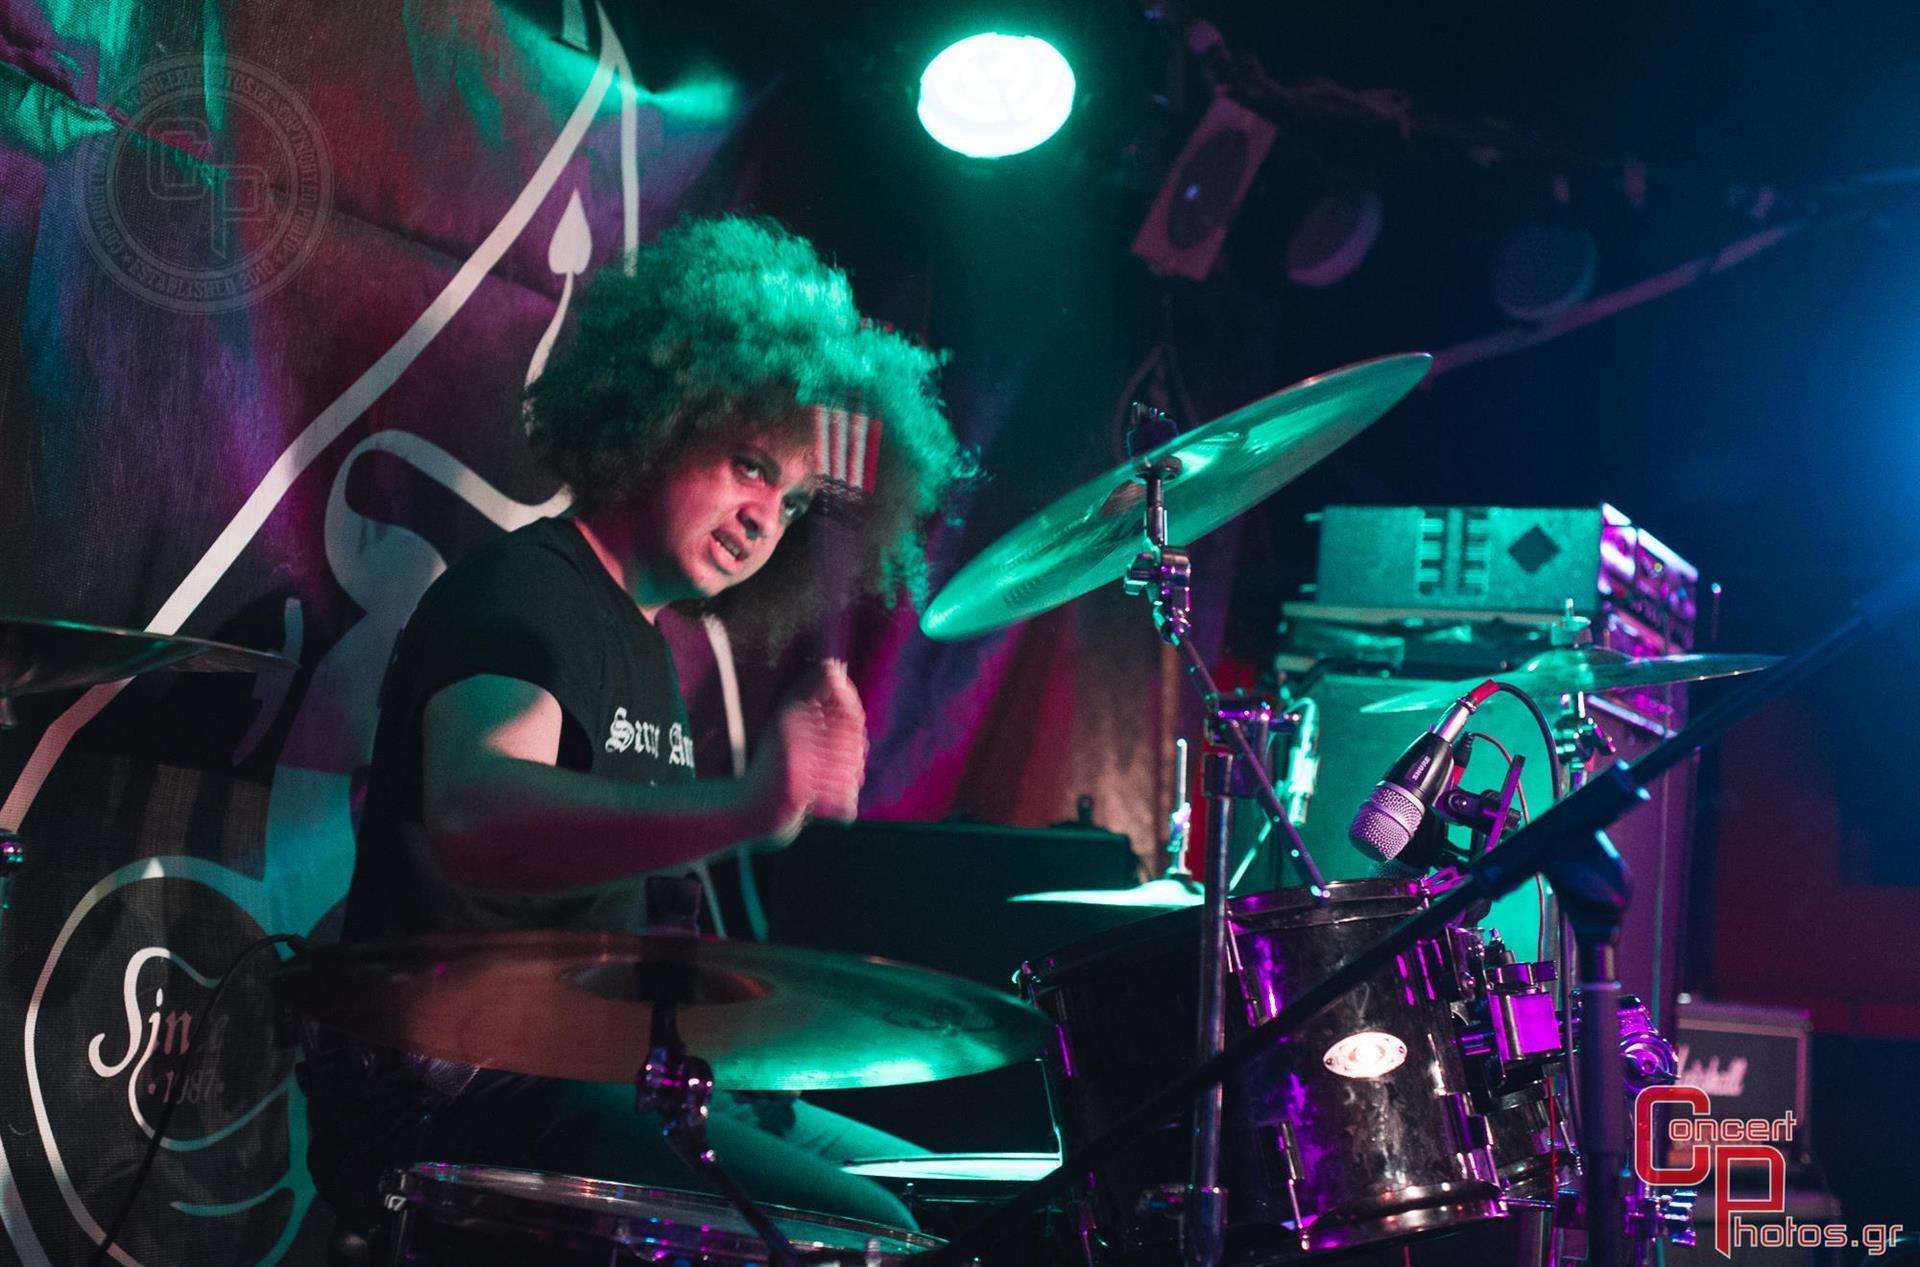 Battle Of The Bands Athens - Leg 3- photographer:  - ConcertPhotos - 20150104_2337_37